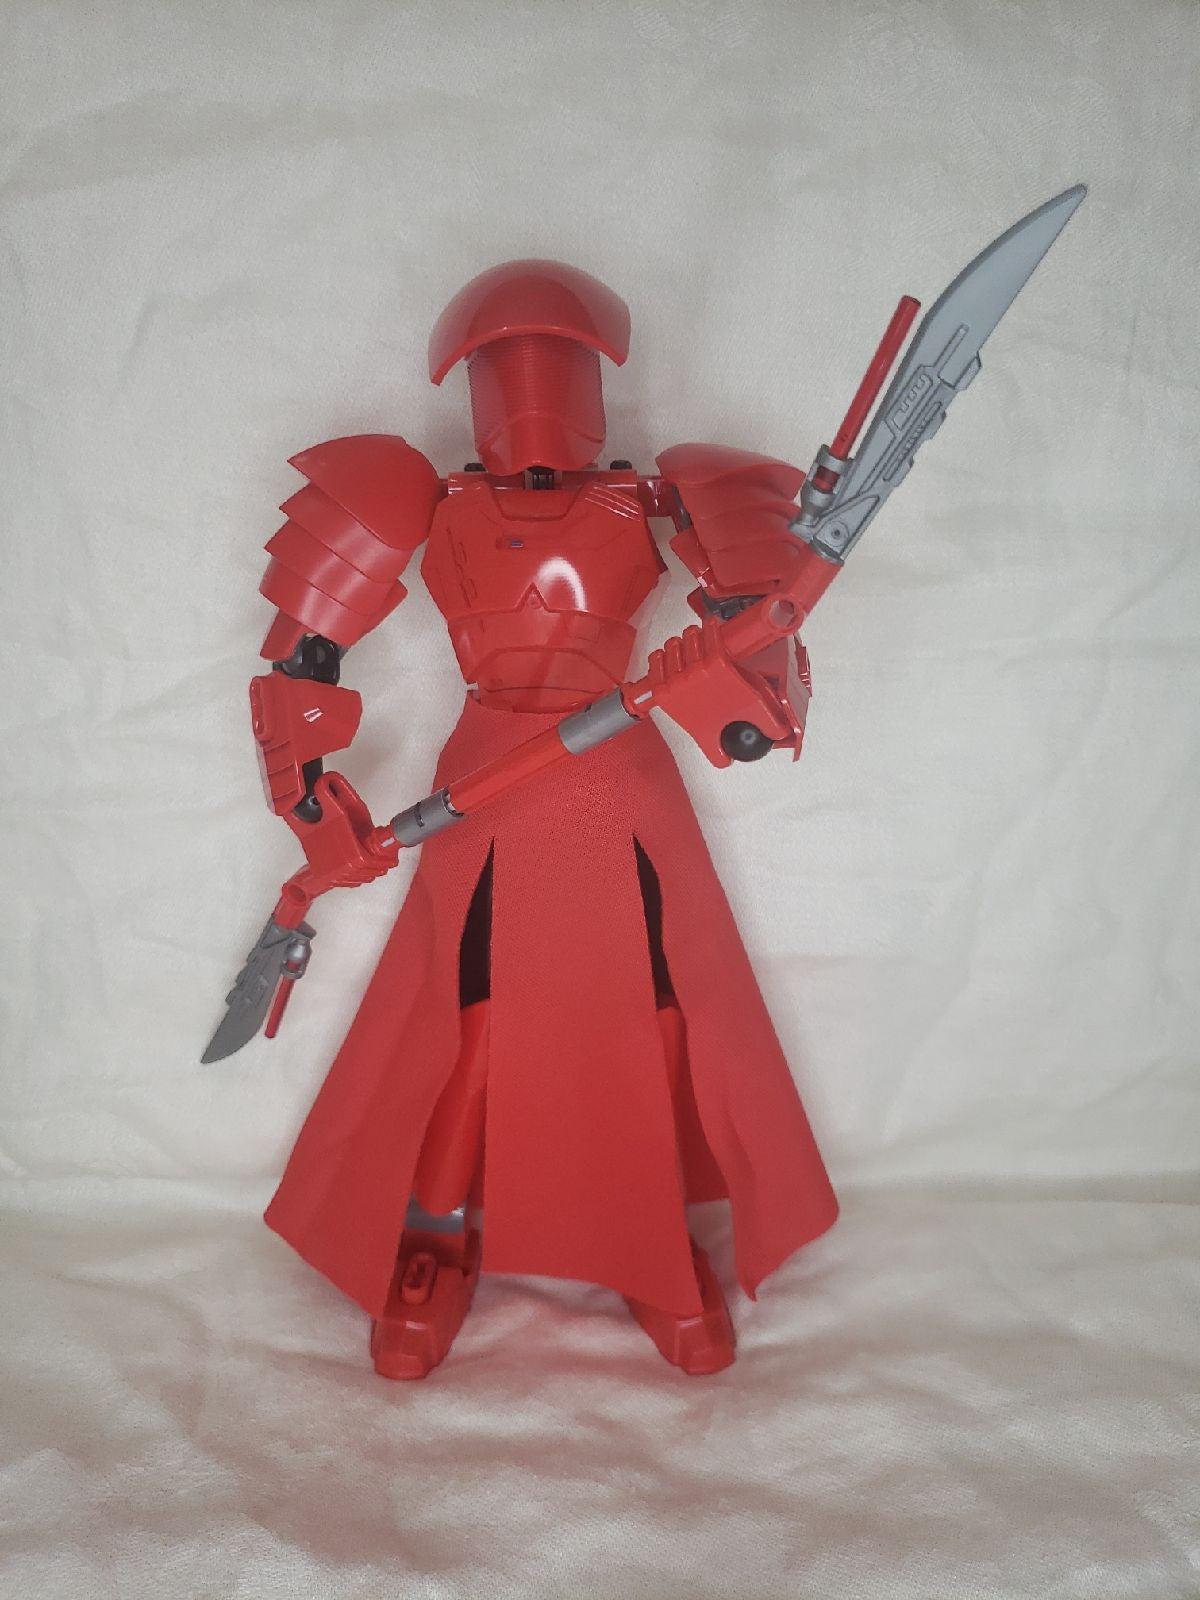 Lego Praetorian Guard